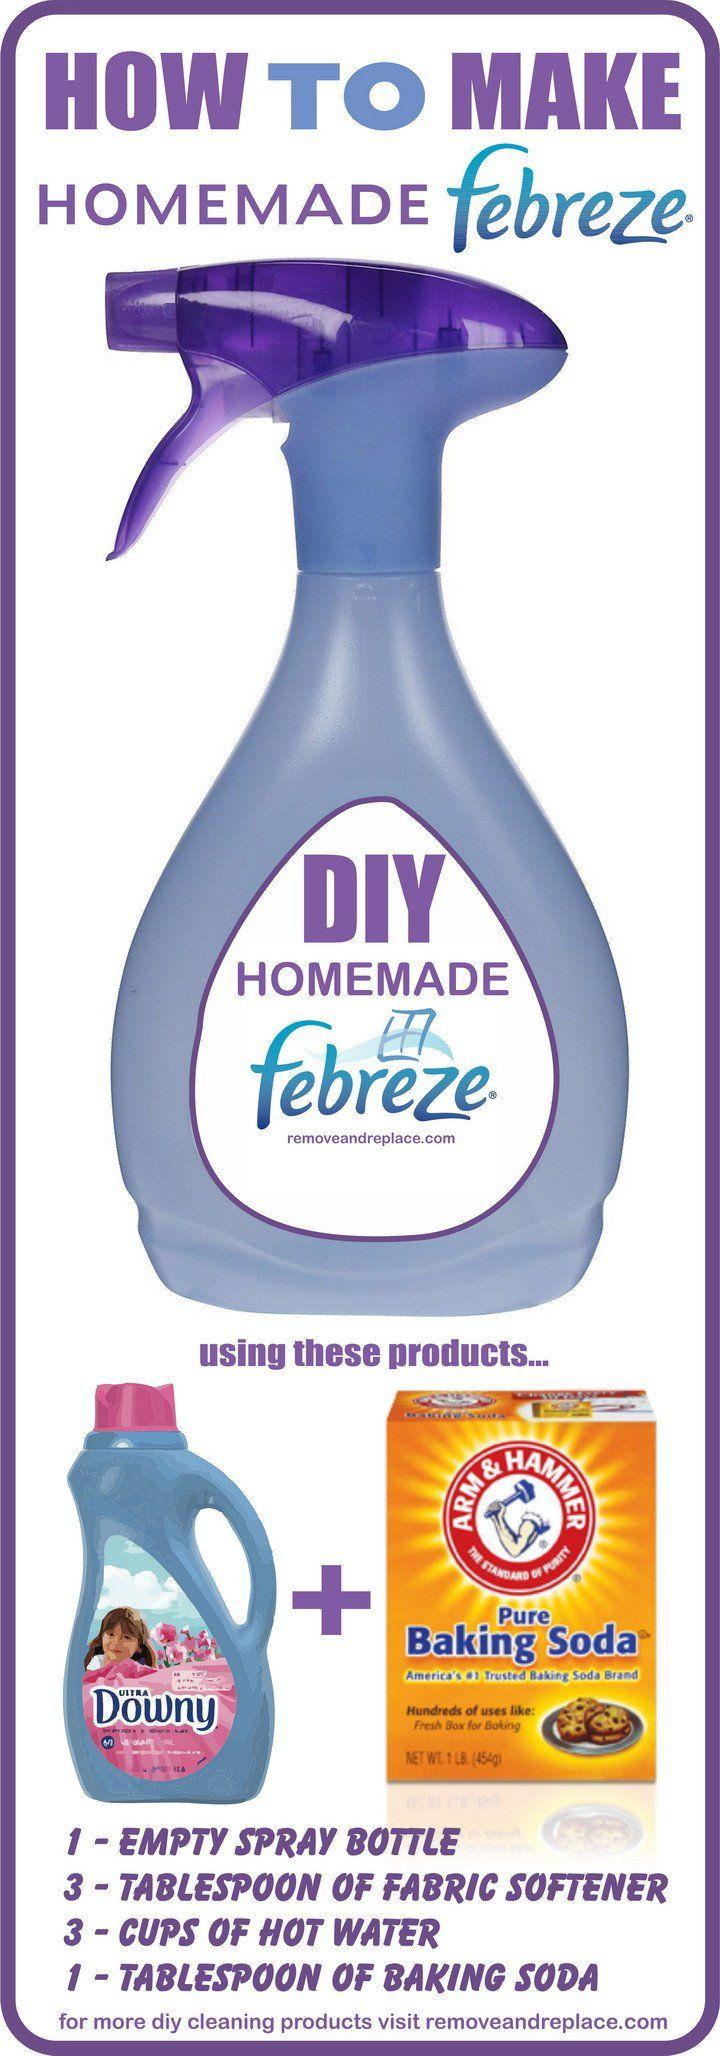 Purggo car air freshener best diy recipe for homemade febreze air freshener